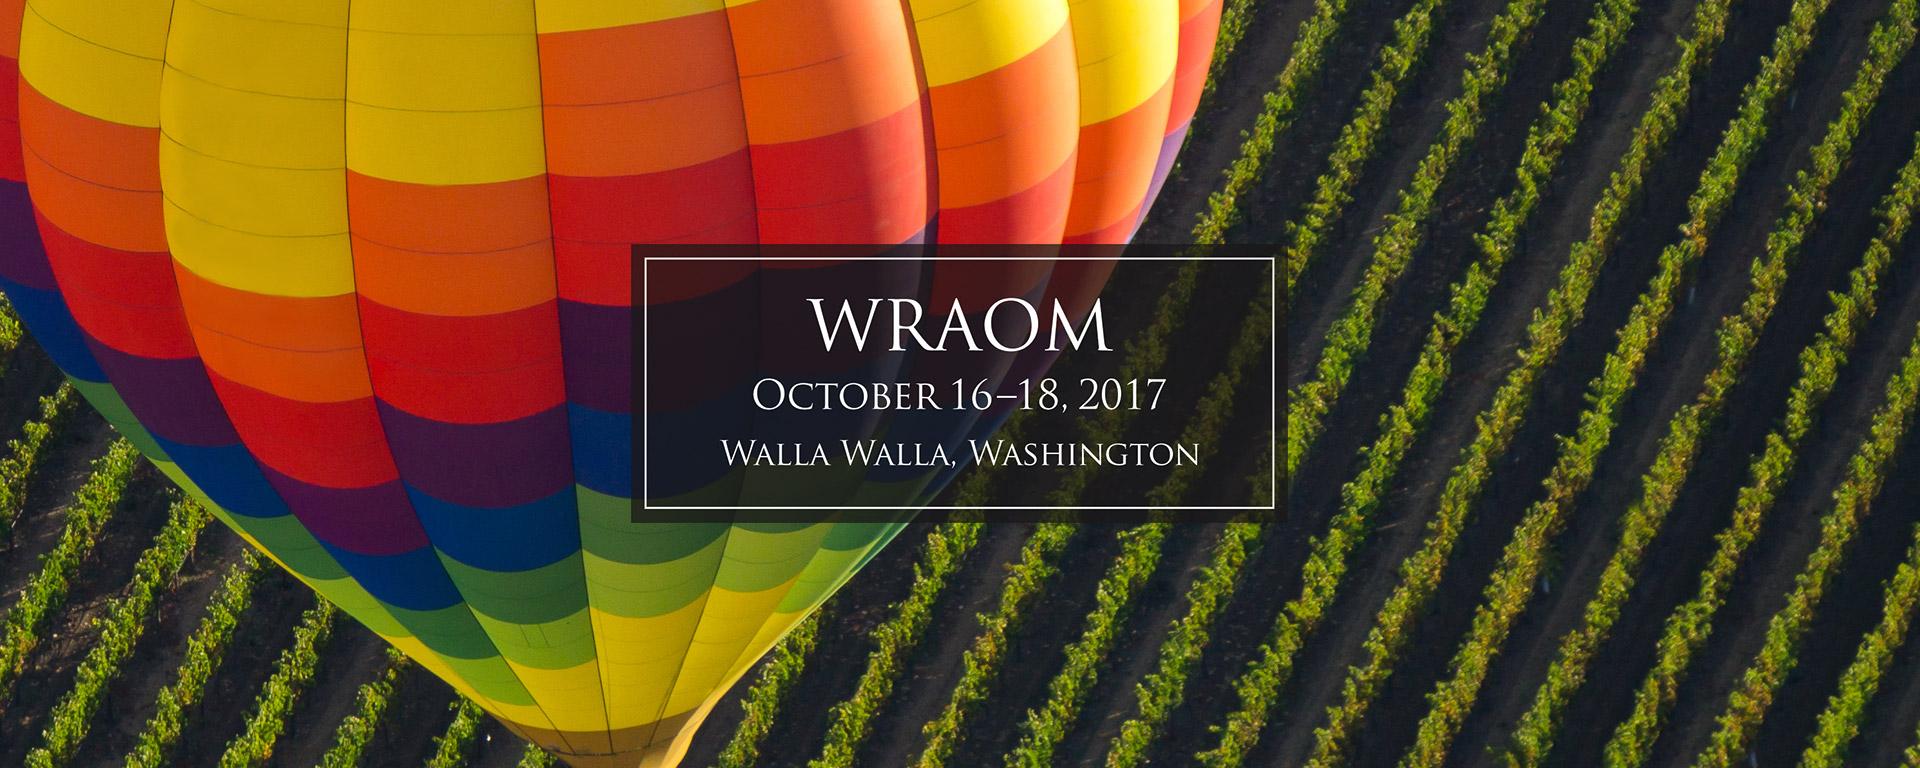 2017 WRAOM, Walla Walla, WA